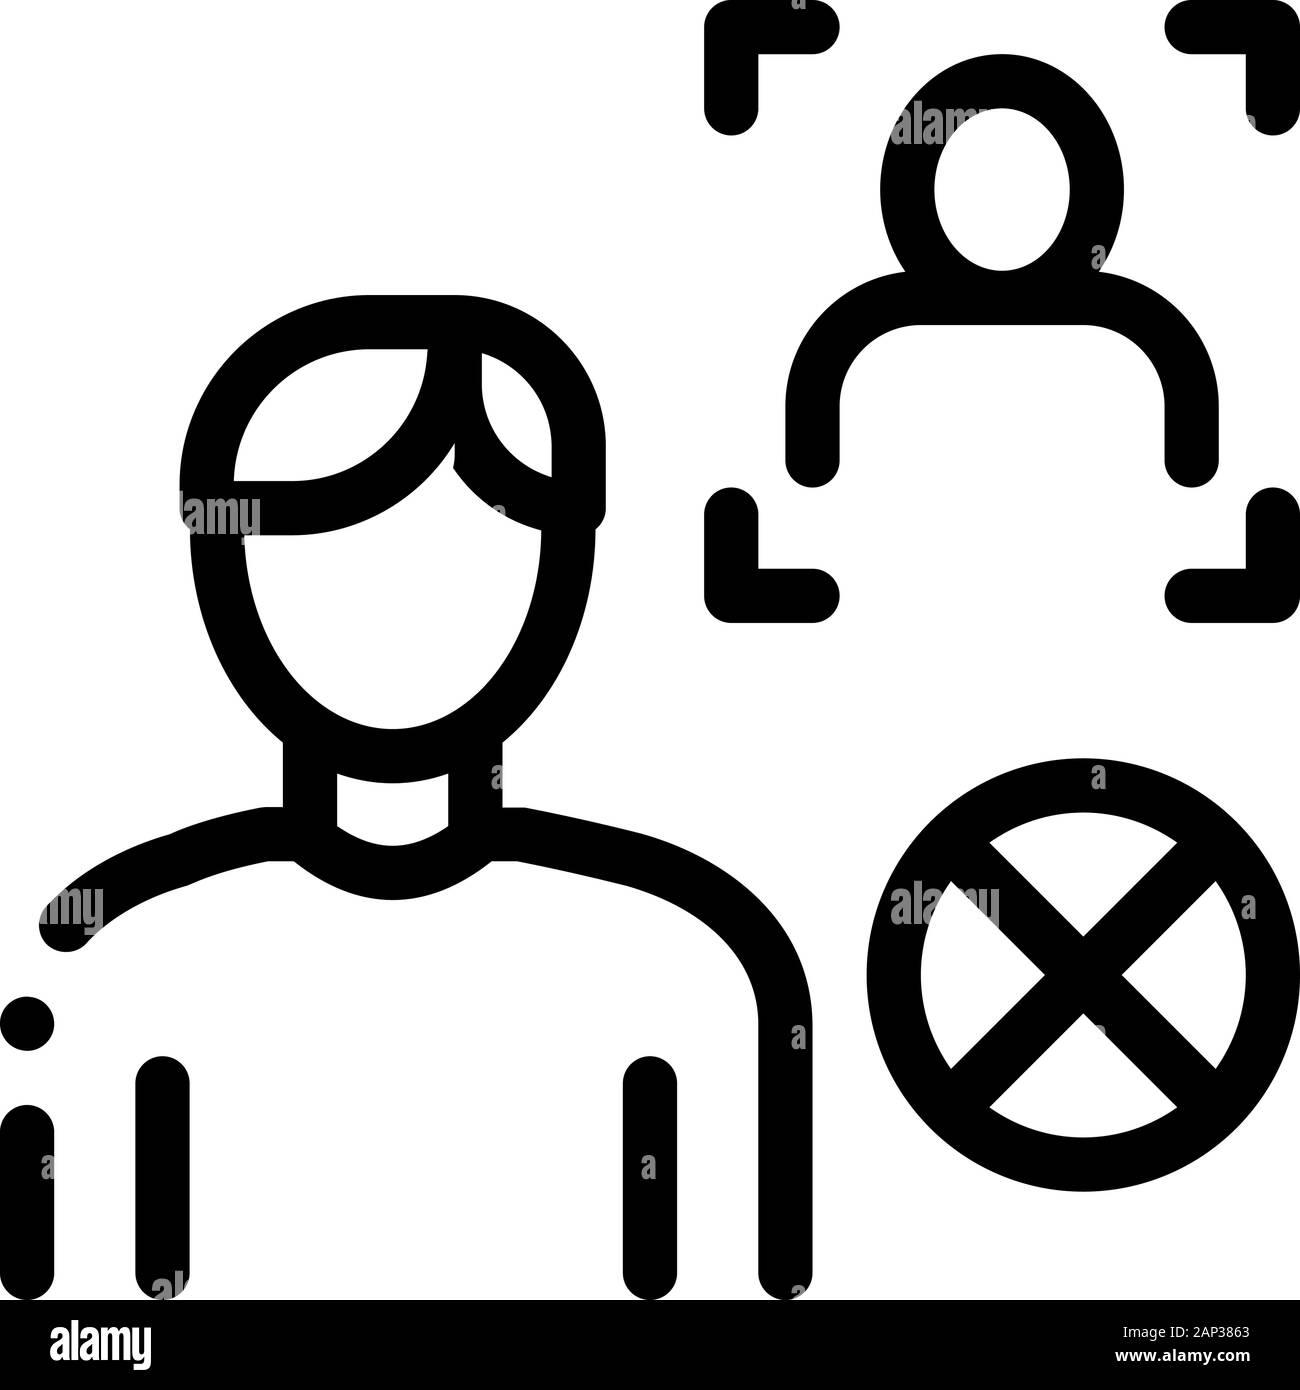 fake man identity icon vector outline illustration stock vector image art alamy https www alamy com fake man identity icon vector outline illustration image340591723 html